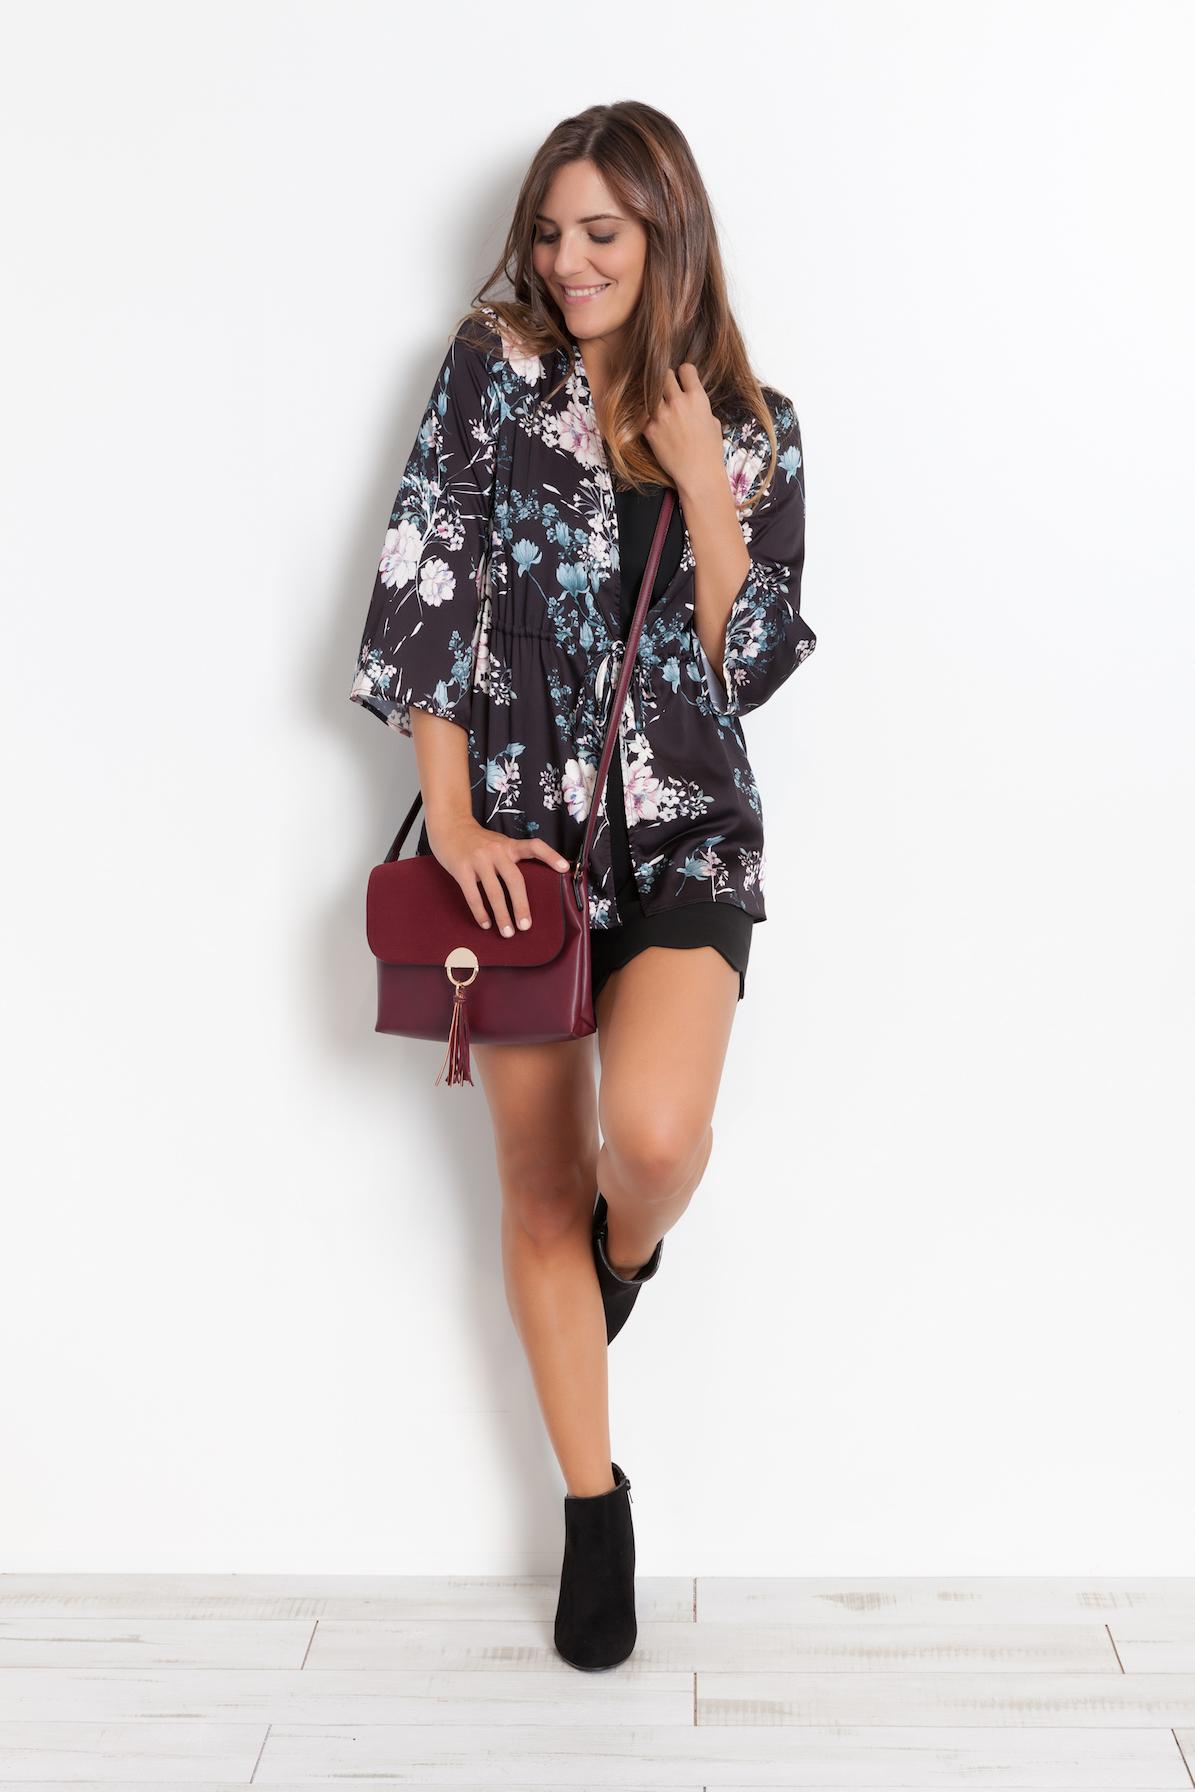 blogueuse mode les caprices d iris